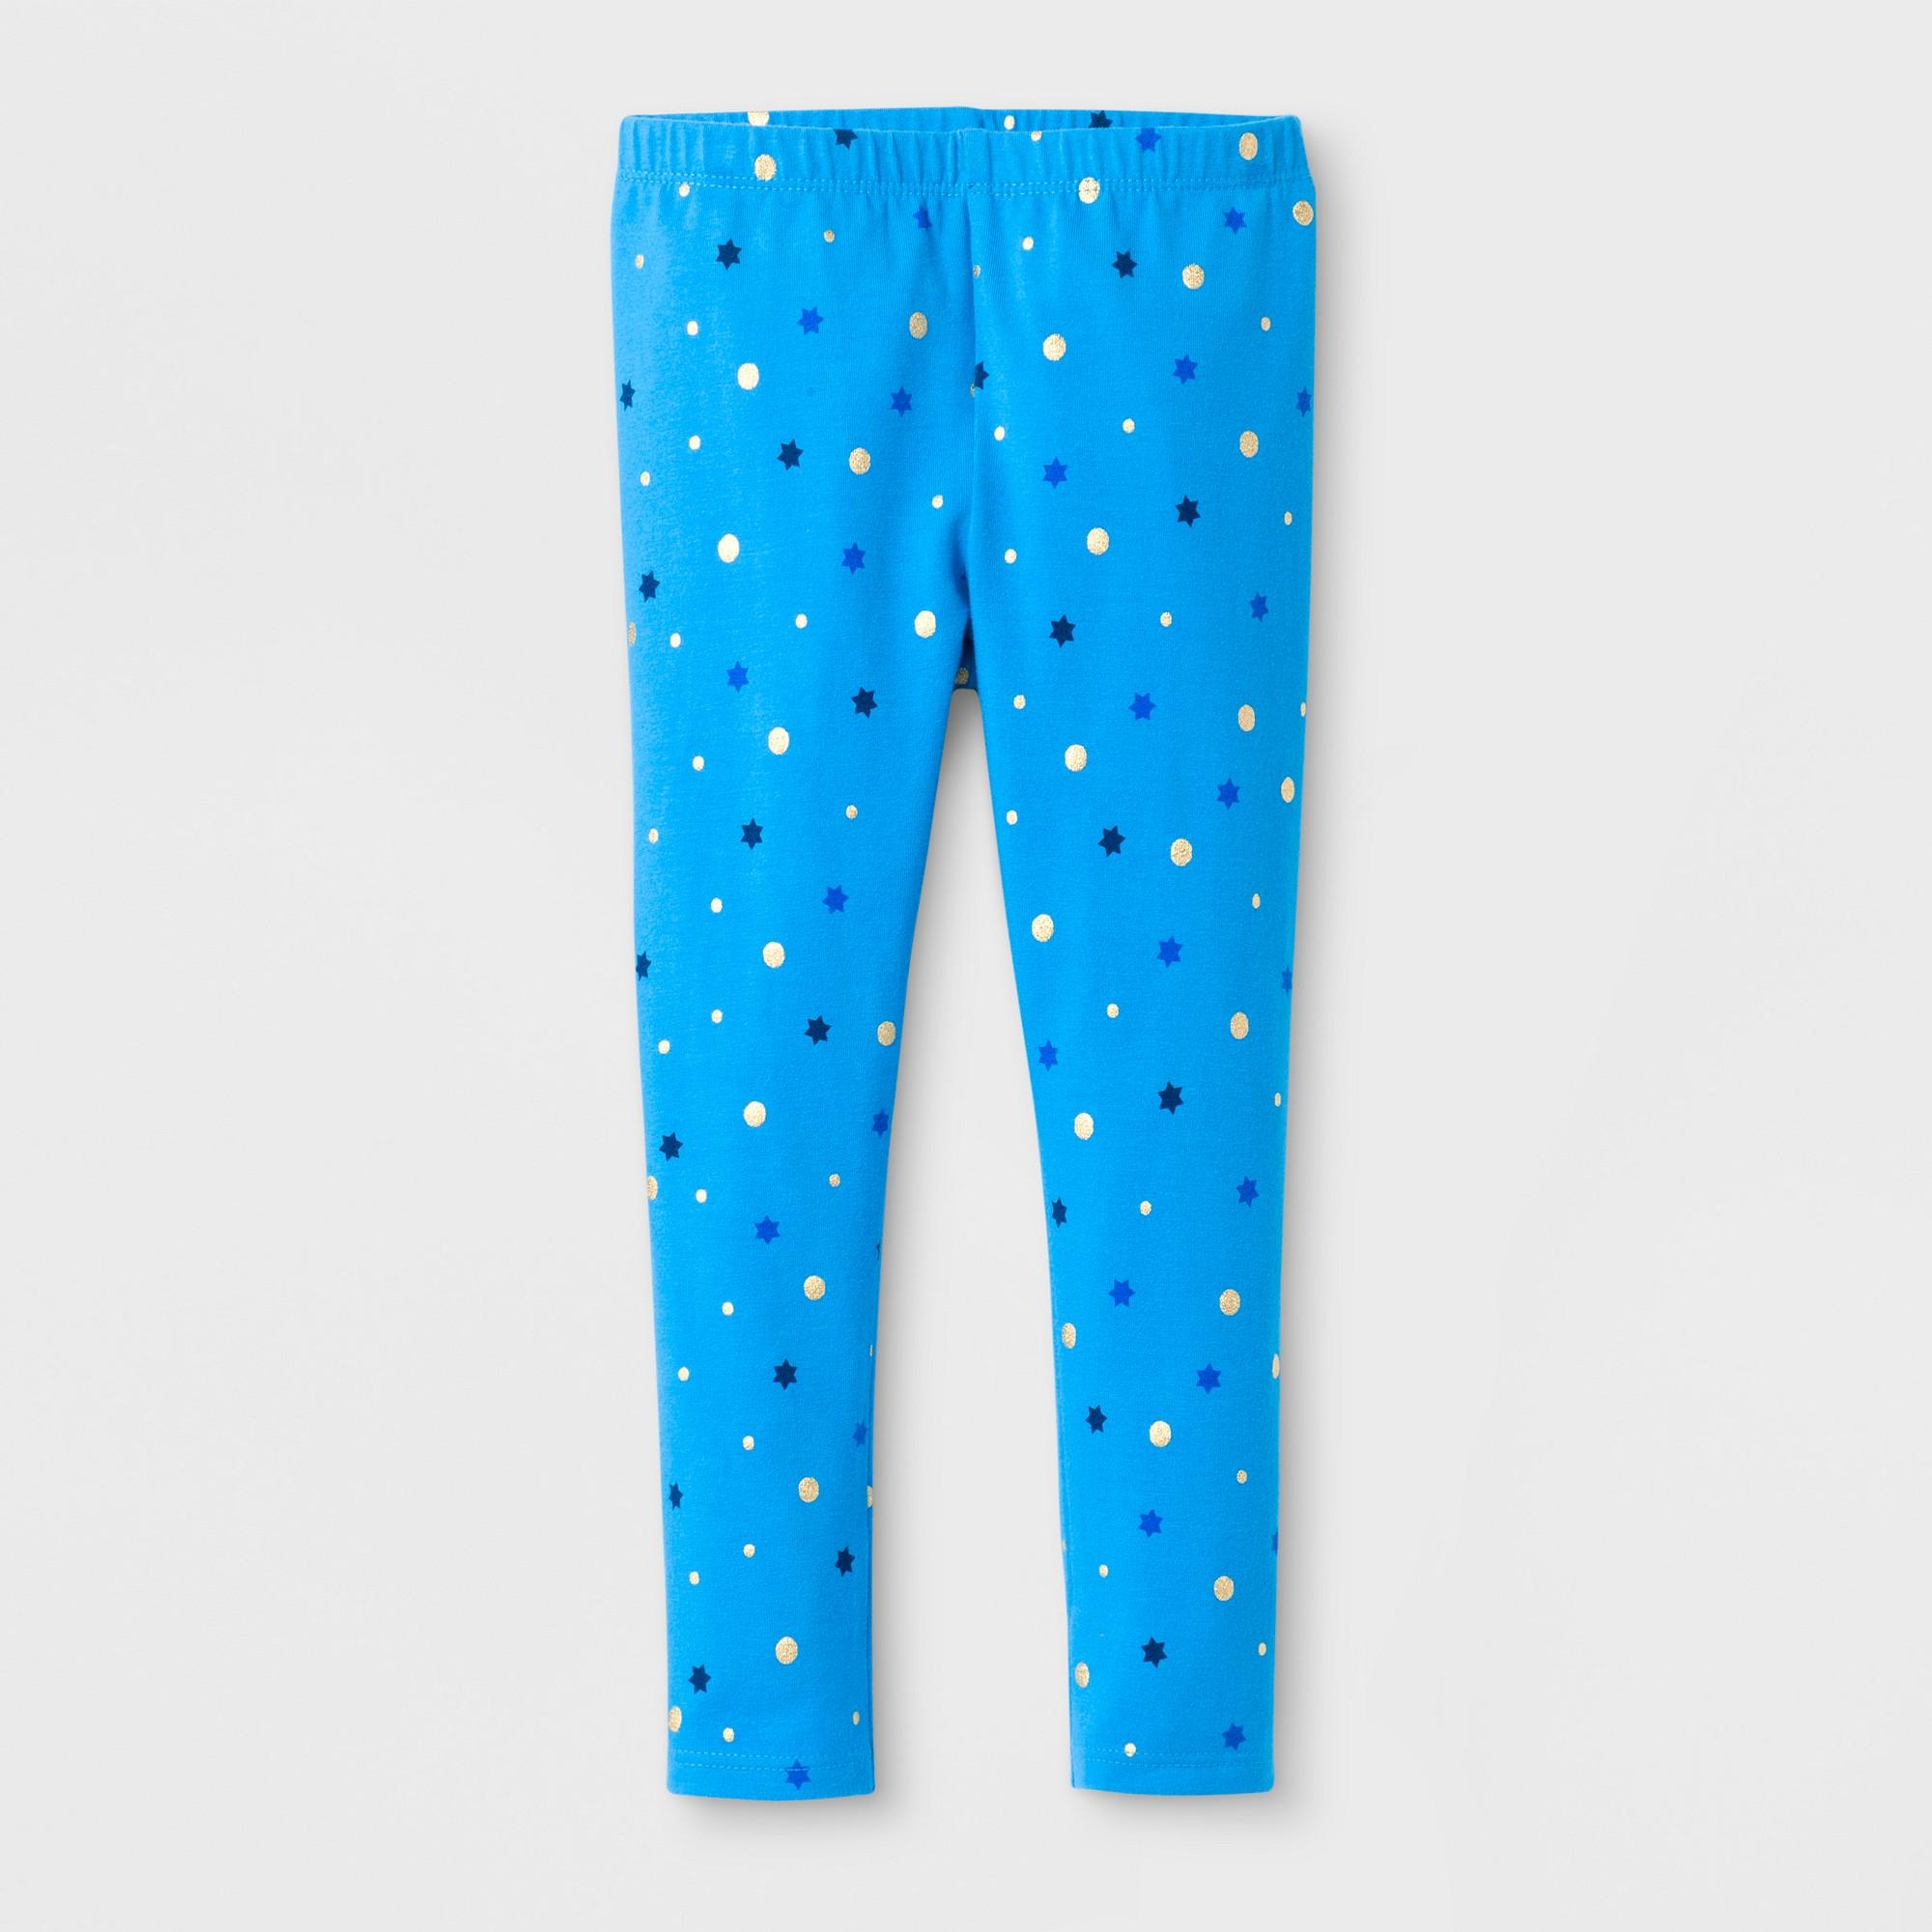 70c34e3b4e77f Toddler Girls' Christmas Leggings Pants - Cat & Jack™ Electra Blue ...